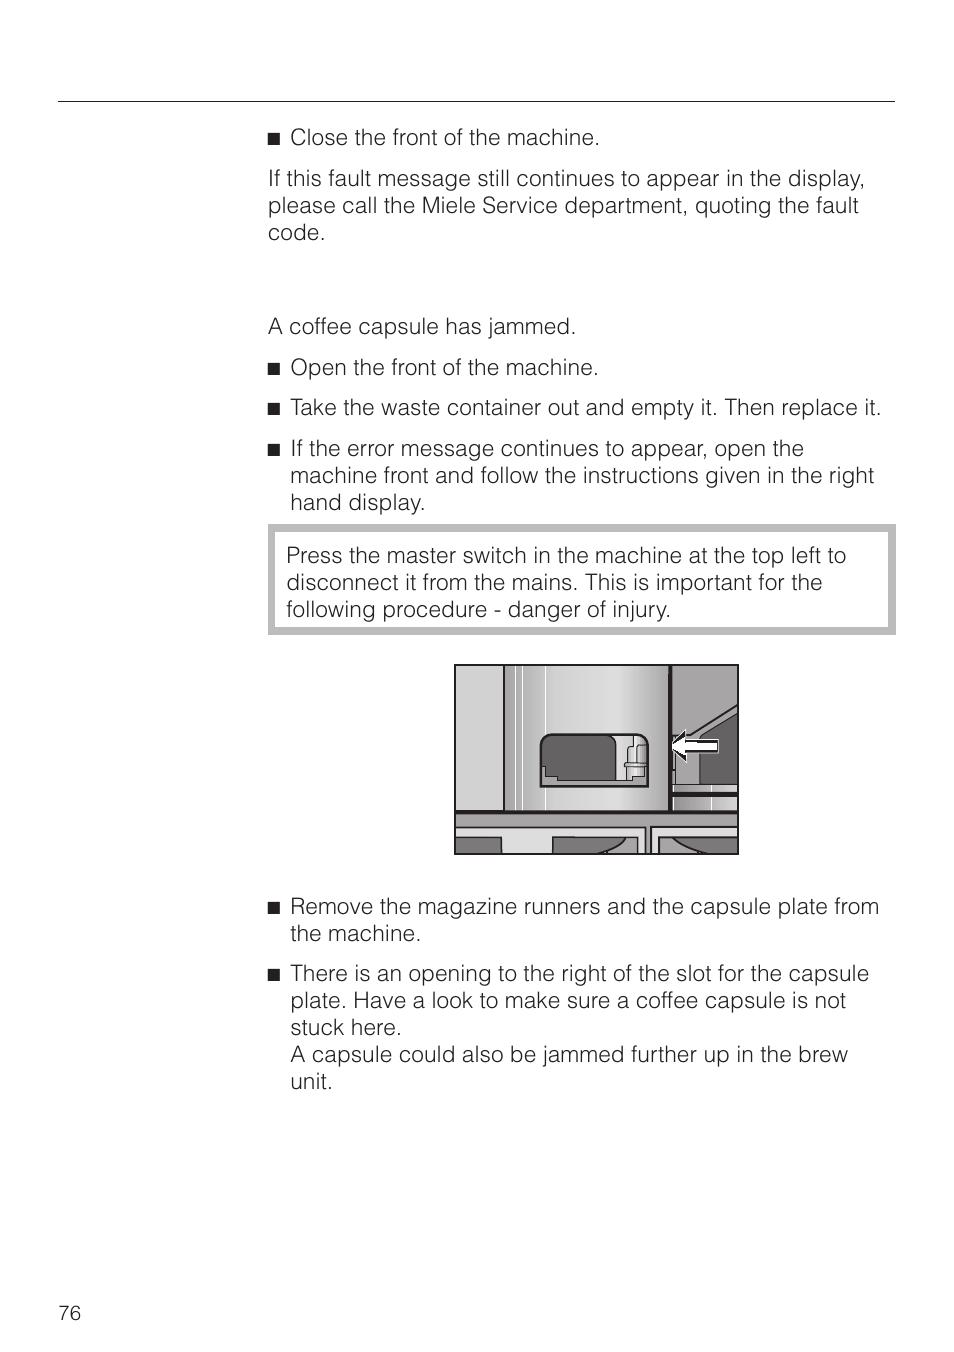 problem solving guide miele cva 2660 user manual page 76 88 rh manualsdir com miele cva 615 service manual miele service manual download g800 pdf zip